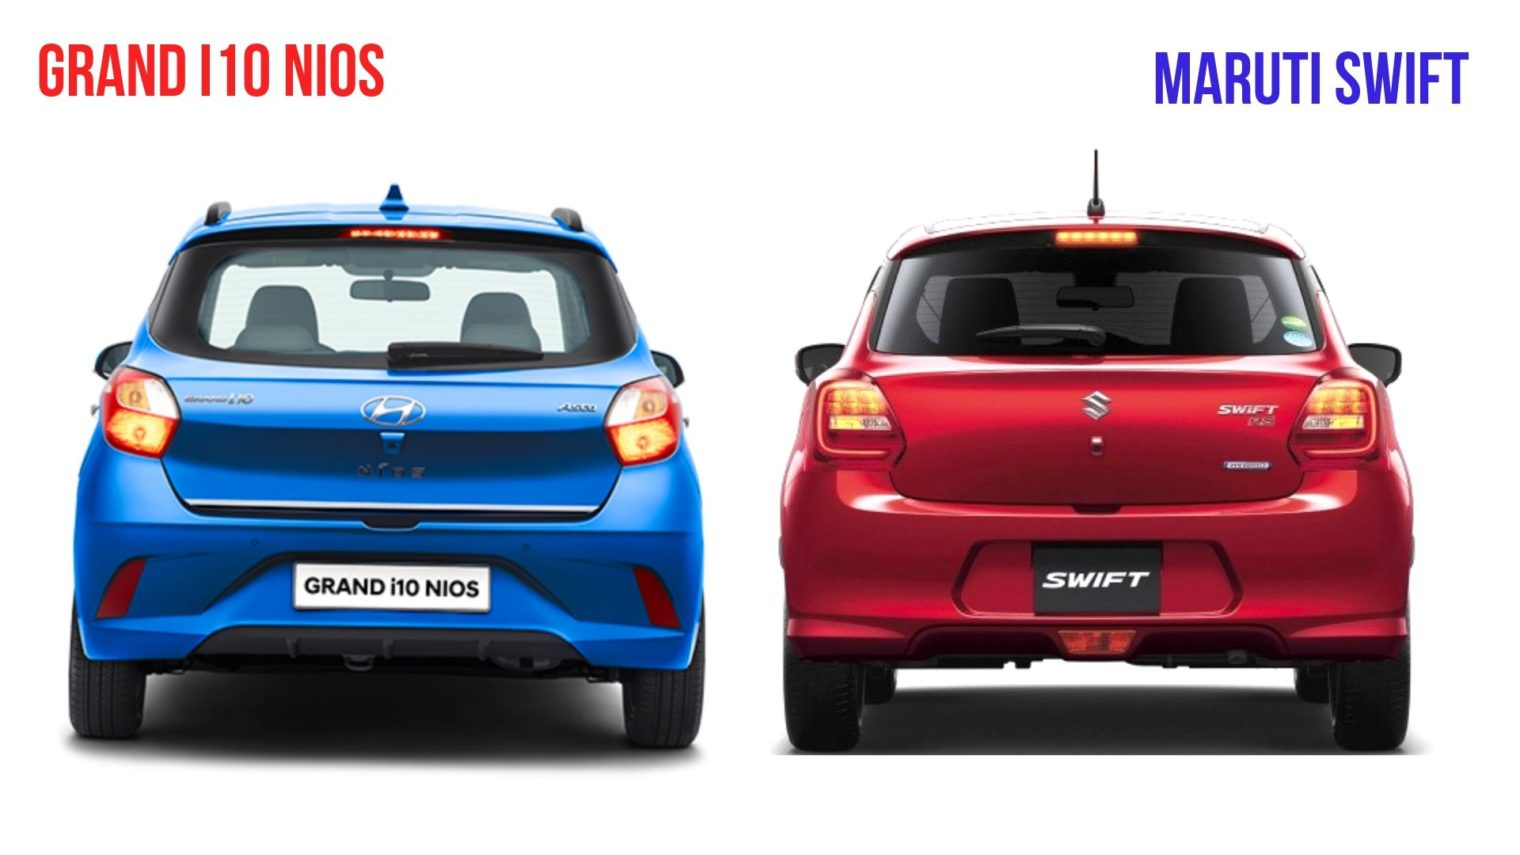 Hyundai Grand i10 Nios vs Maruti Suzuki Swift Comparison3